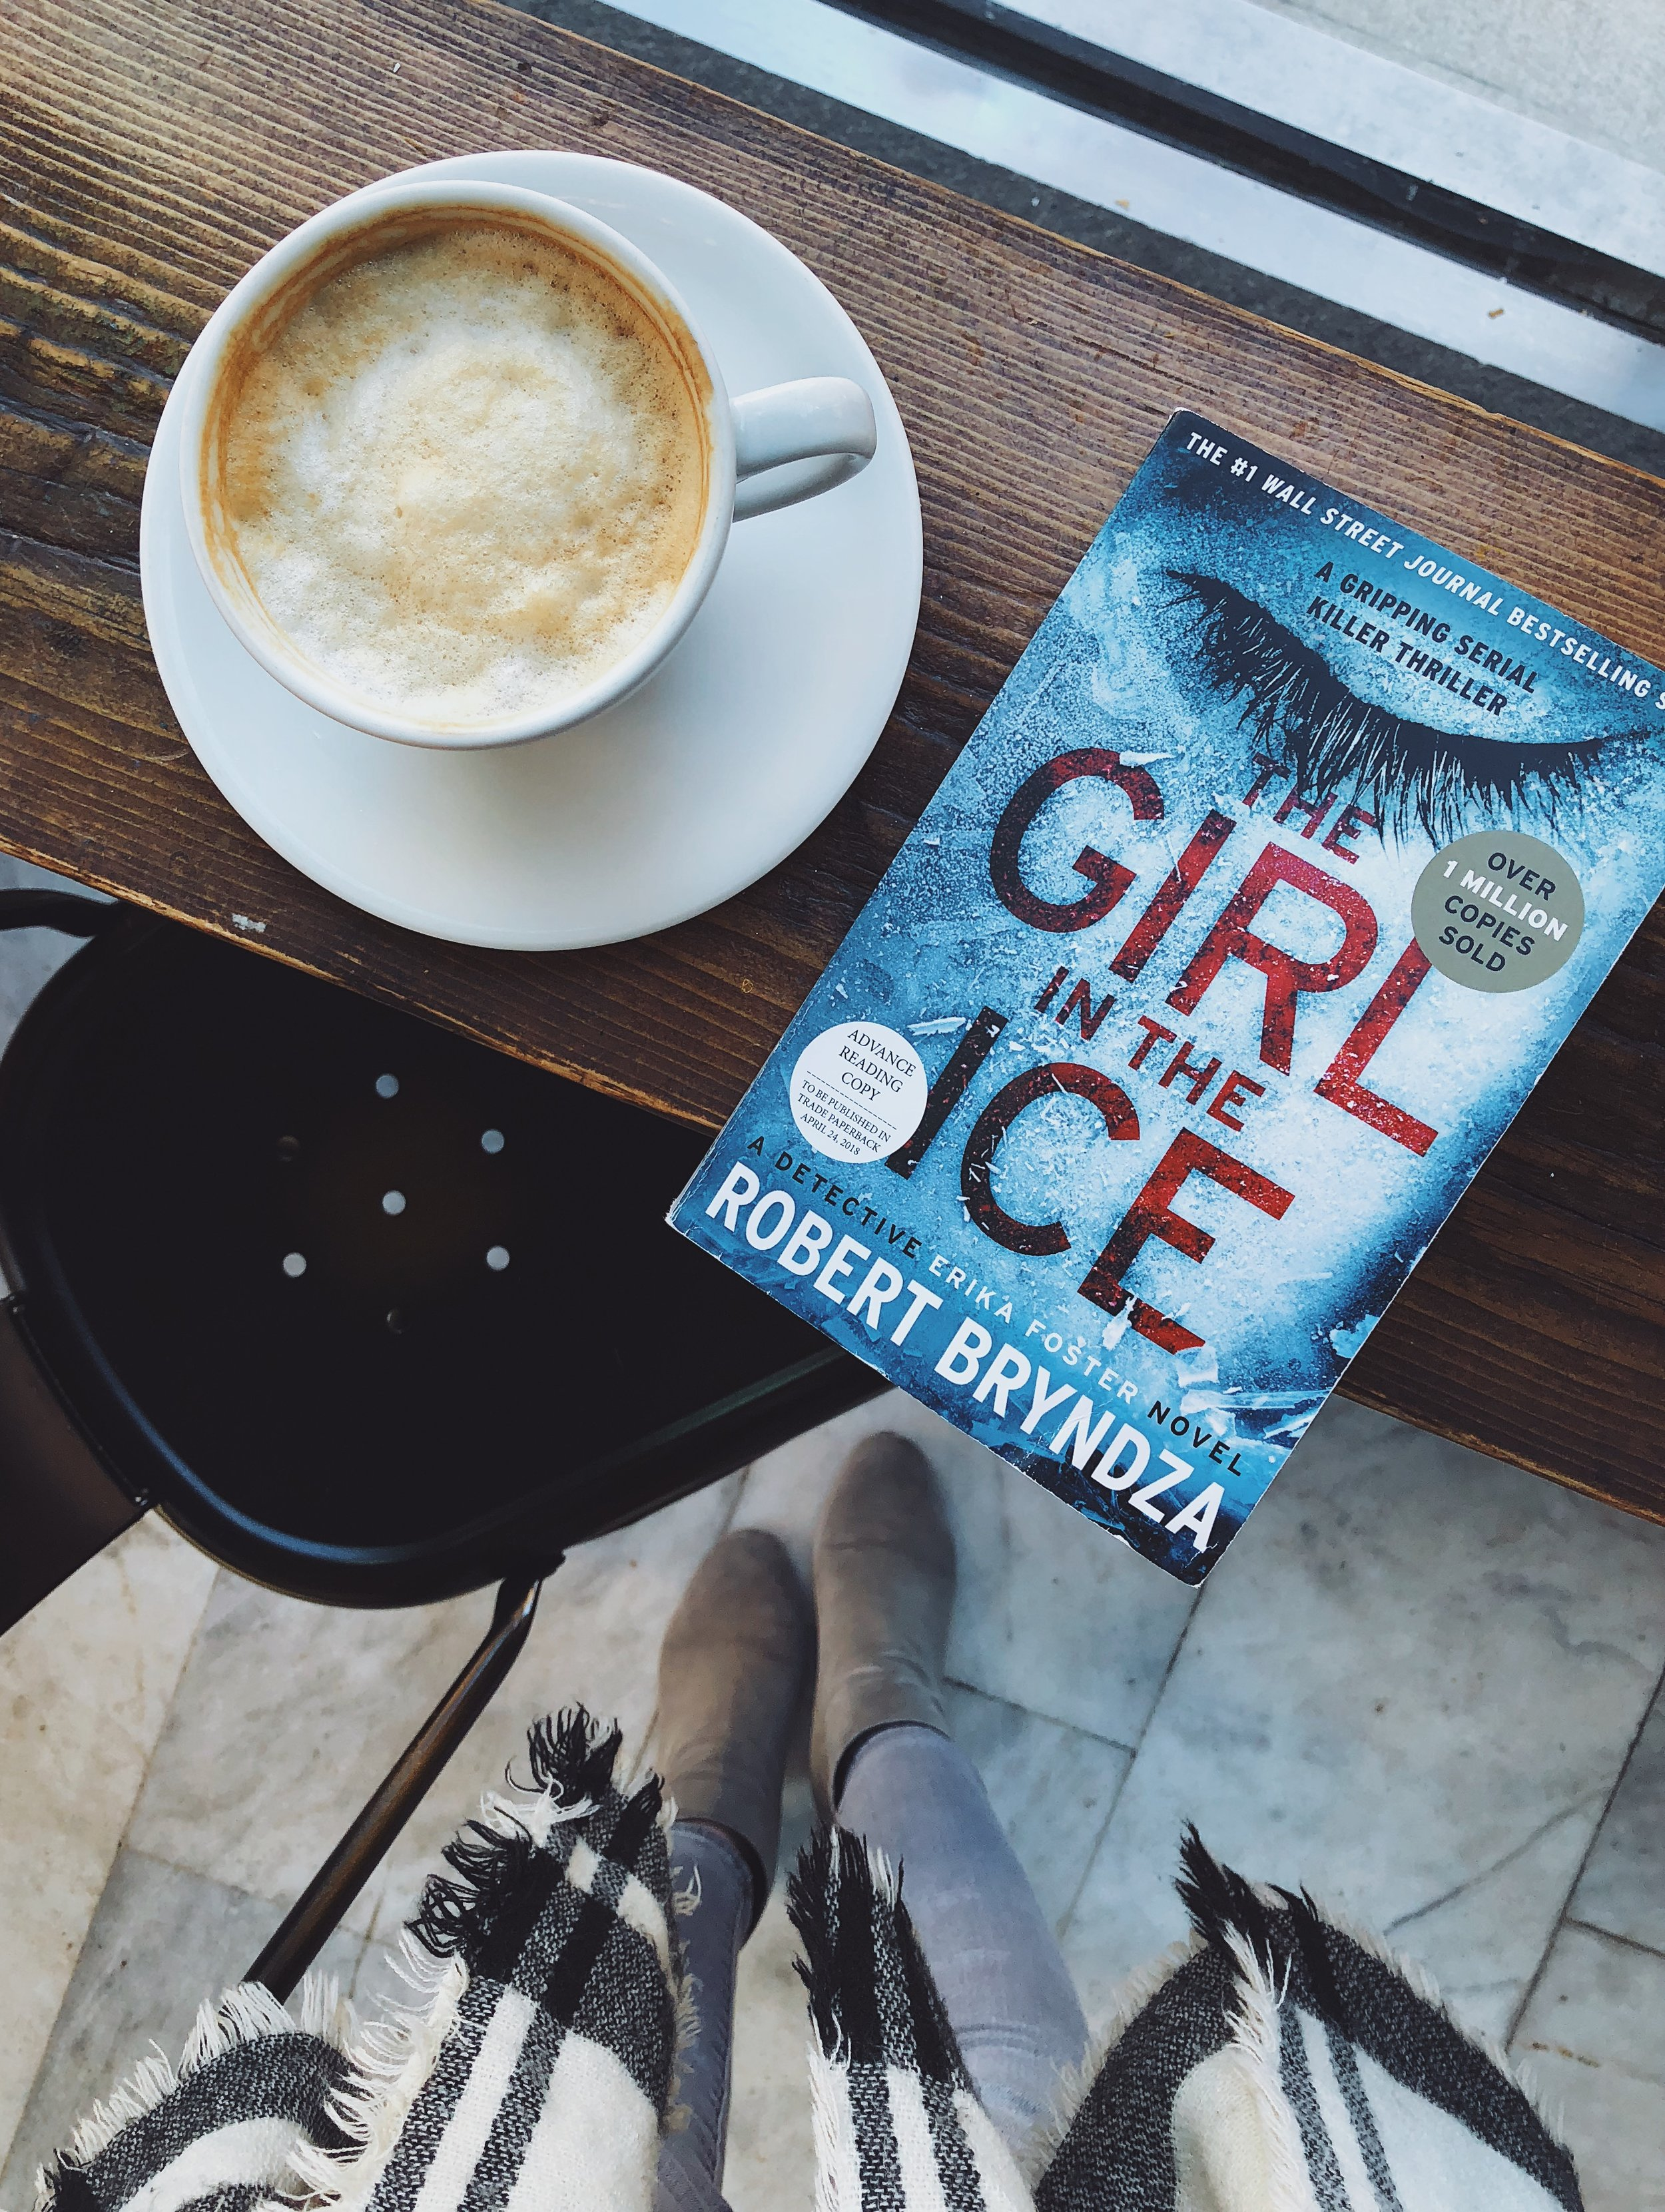 The Girl in the Ice.JPG